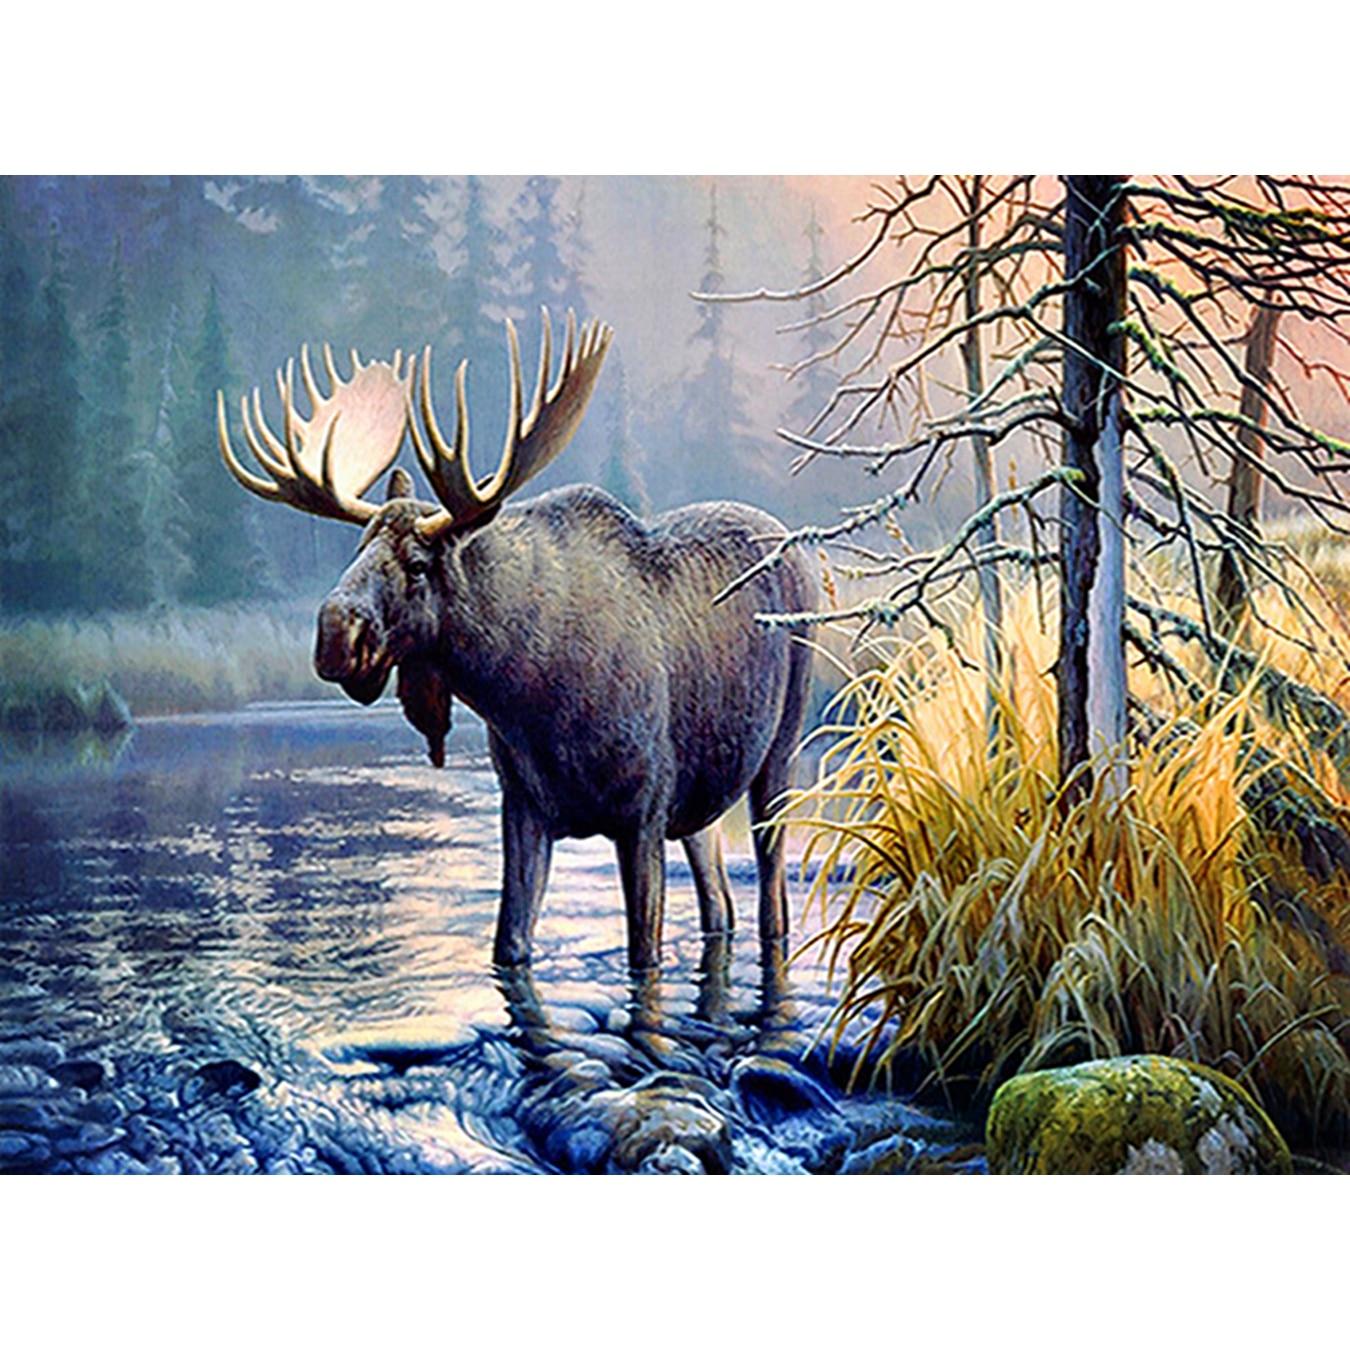 Deer,Diamond Painting,Cross Stitch,5D,DIY,Animal,Needlework,Embroidery,Round Rhinestone,Room Decoration,Fashion Crafts,Art,Gift